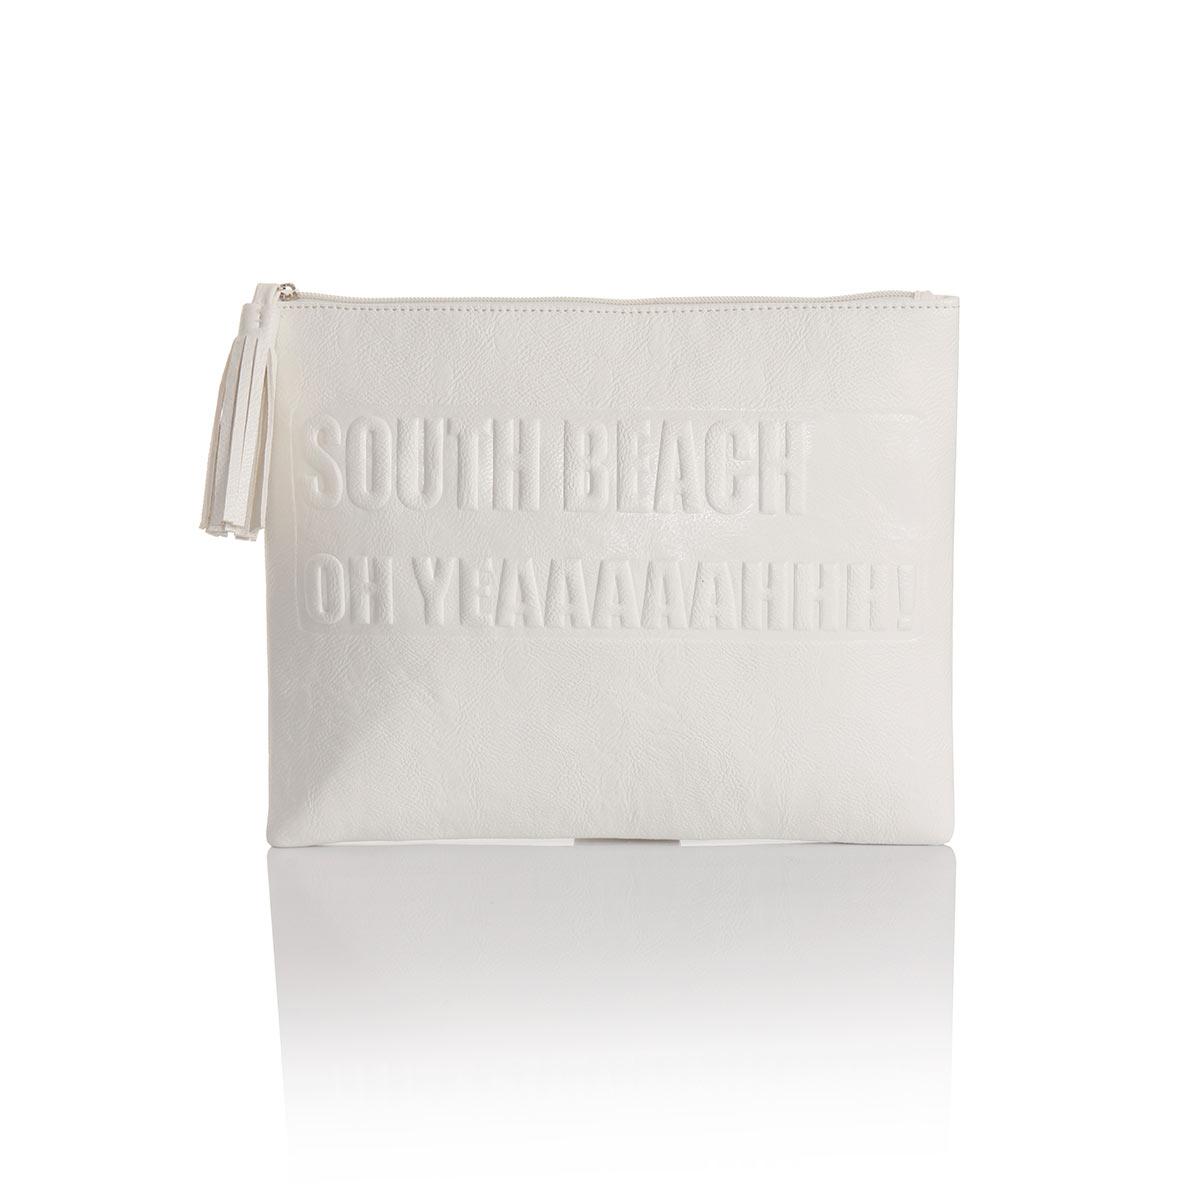 pochette maquillage blanche pour femme avec criture styl e. Black Bedroom Furniture Sets. Home Design Ideas